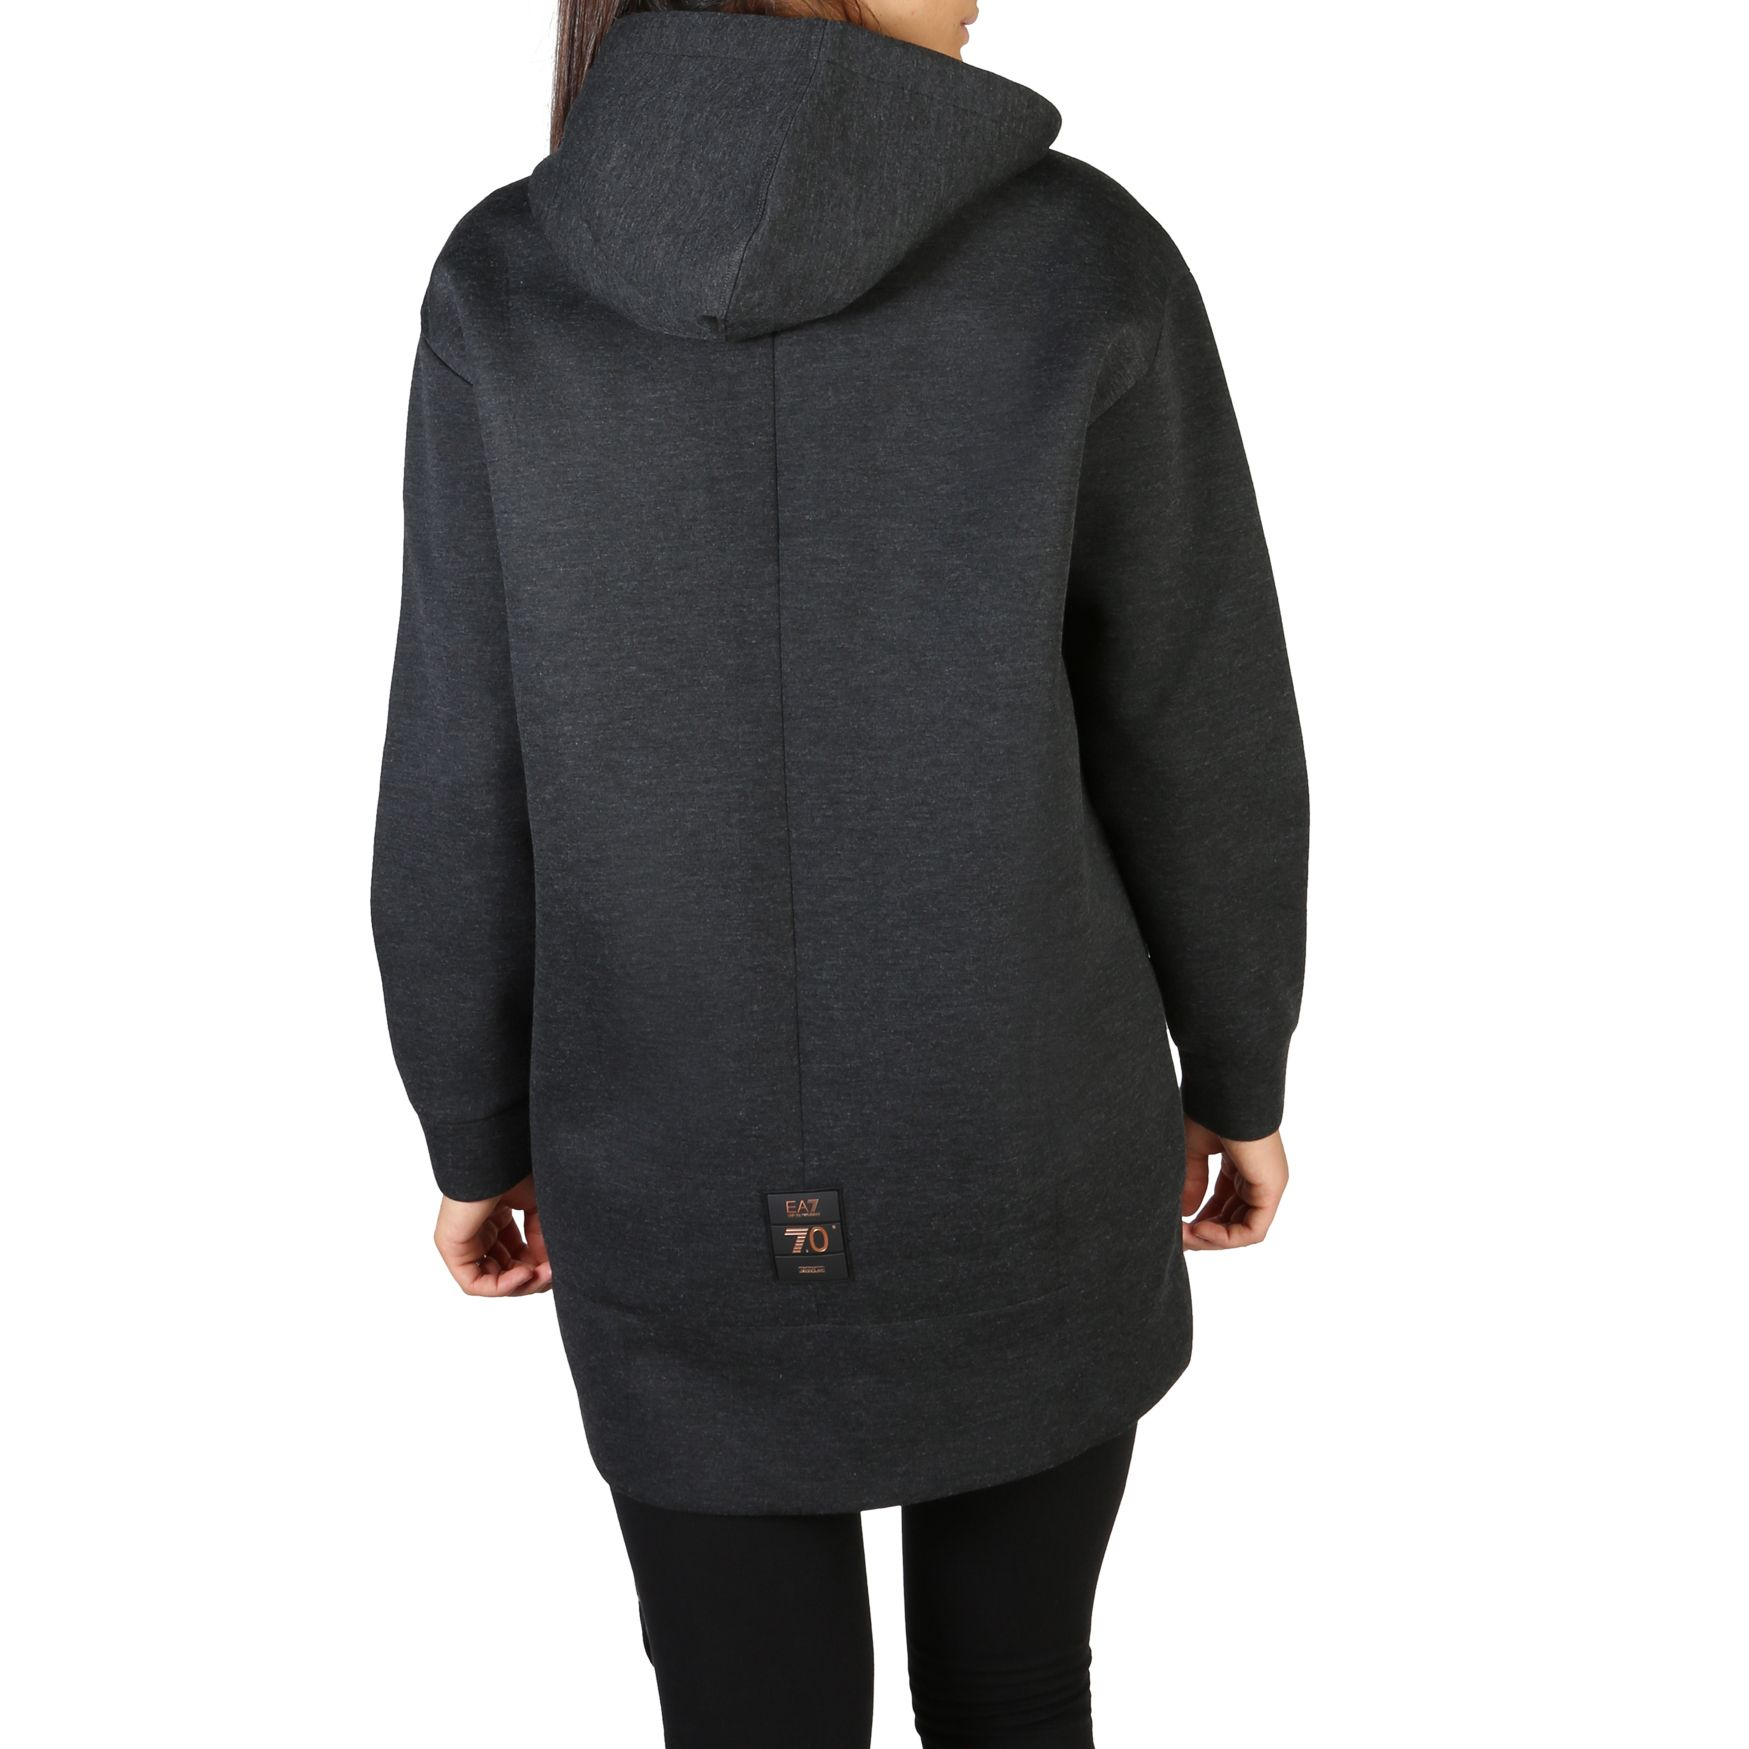 Ea7 Womens Sweatshirts